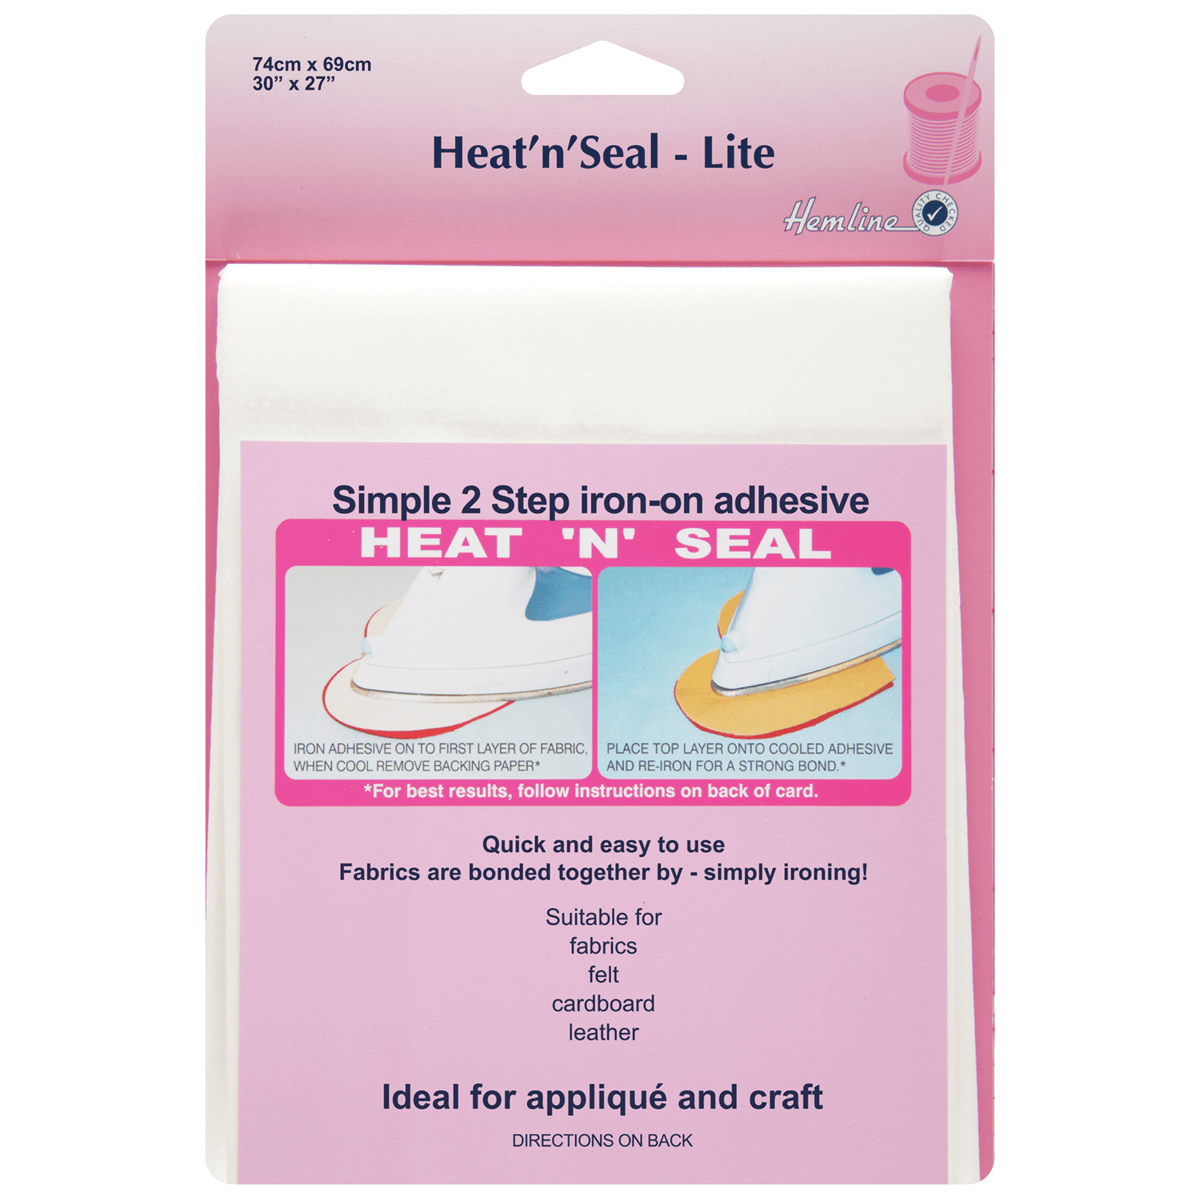 Hemline Heat n Seal Lite: 74cm x 69cm Adhesive Bonds Fabric